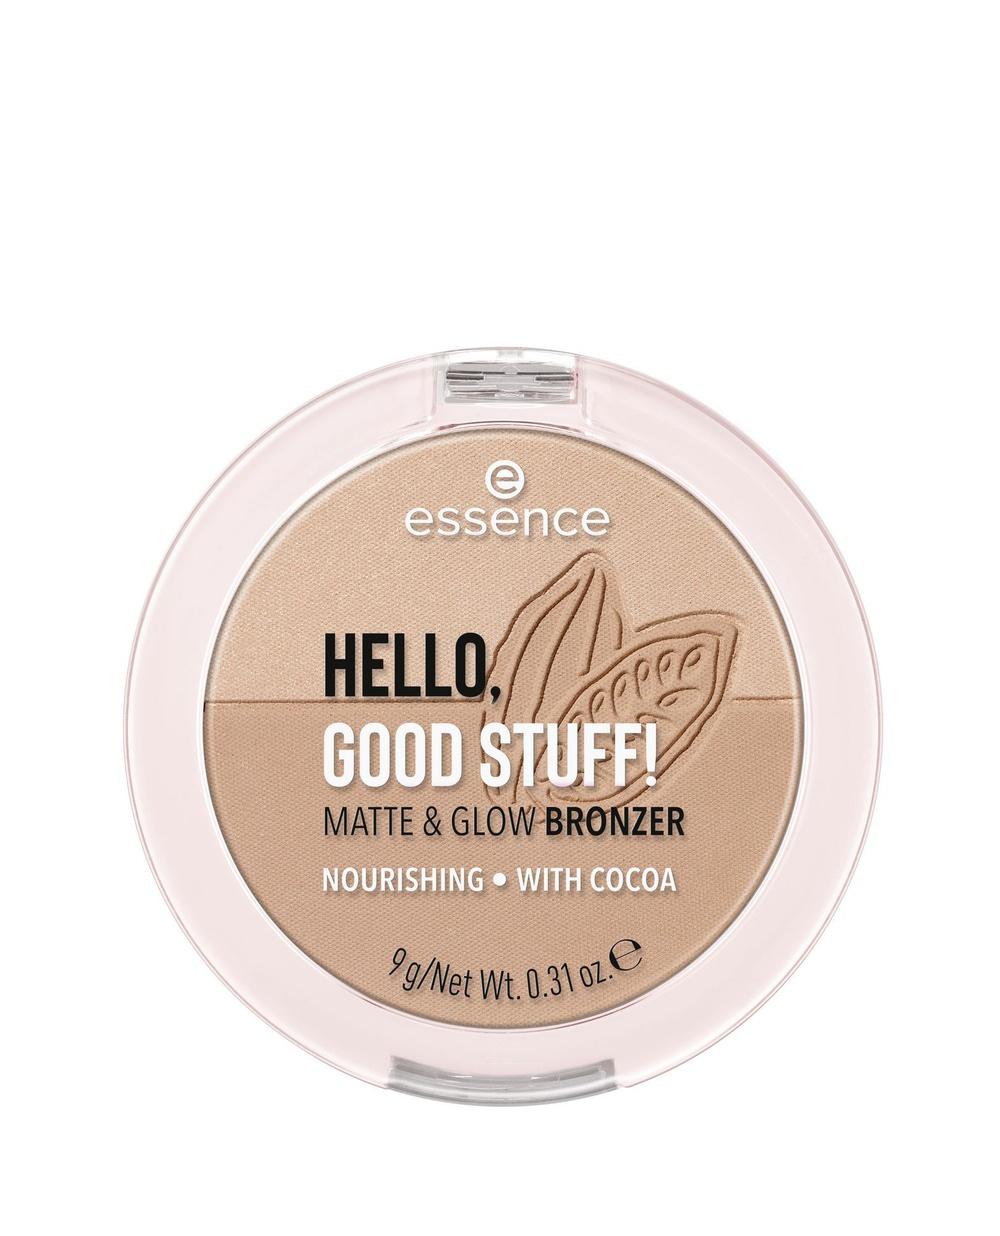 Бронзер essence, Hello, Good Stuff! 10 Cocoa